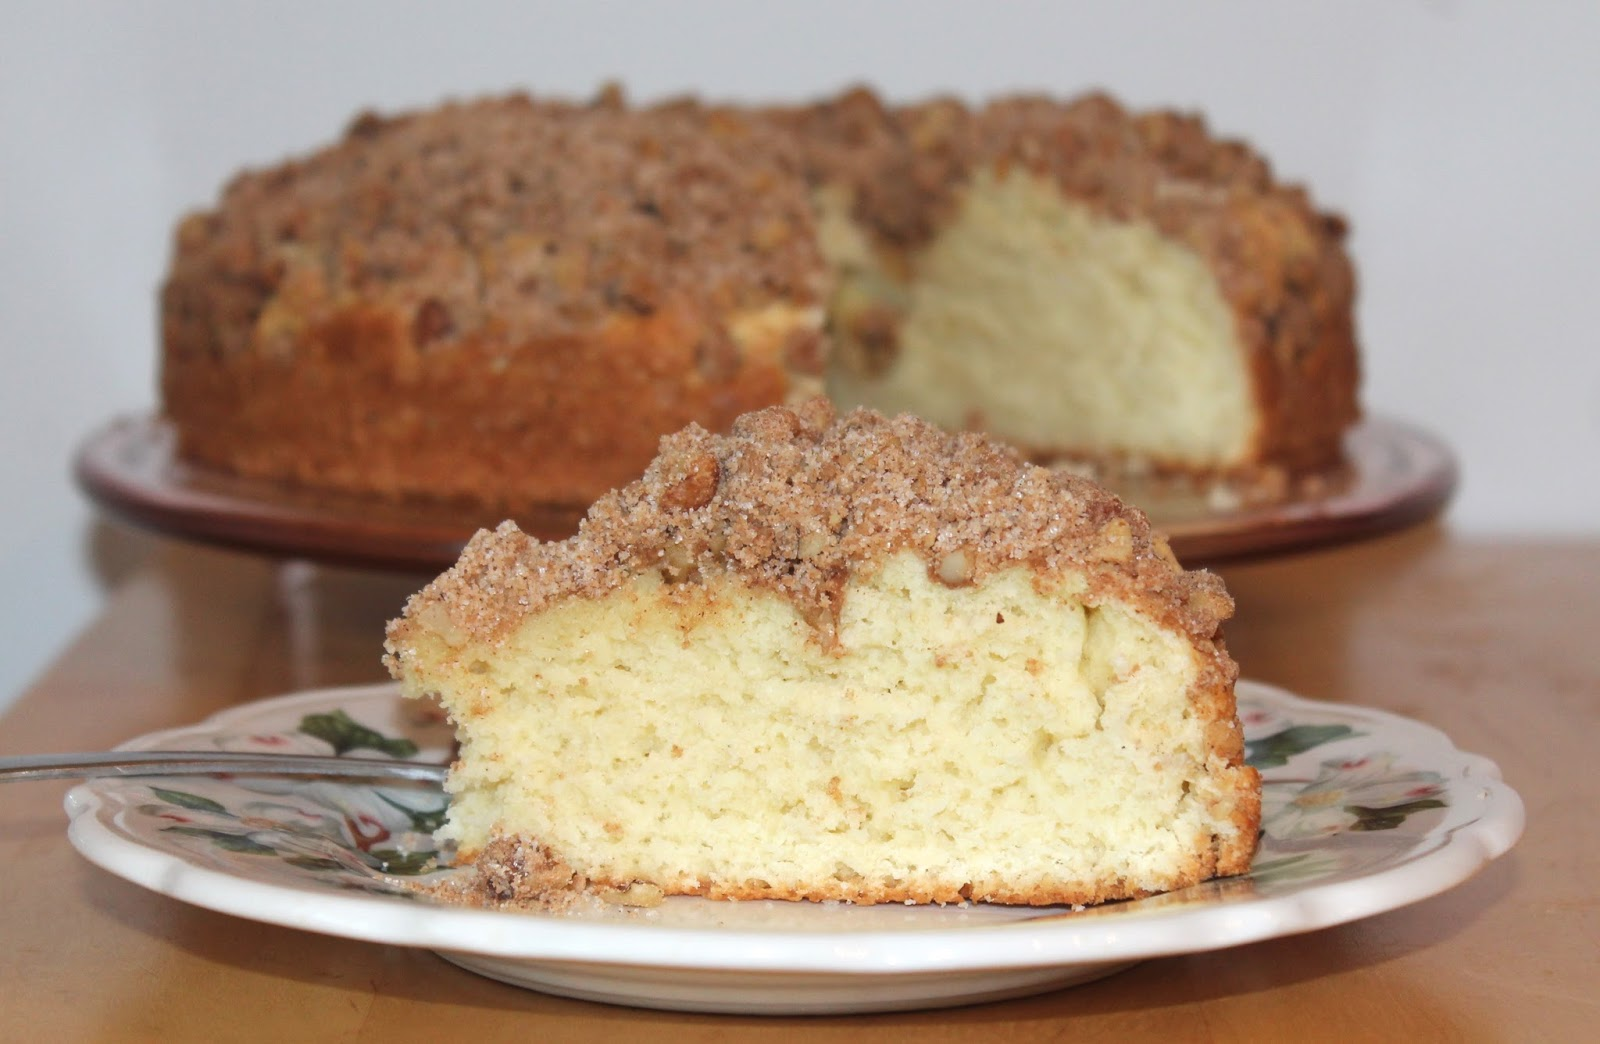 Savory Moments: Quick coffee cake (Blitzkuchen)